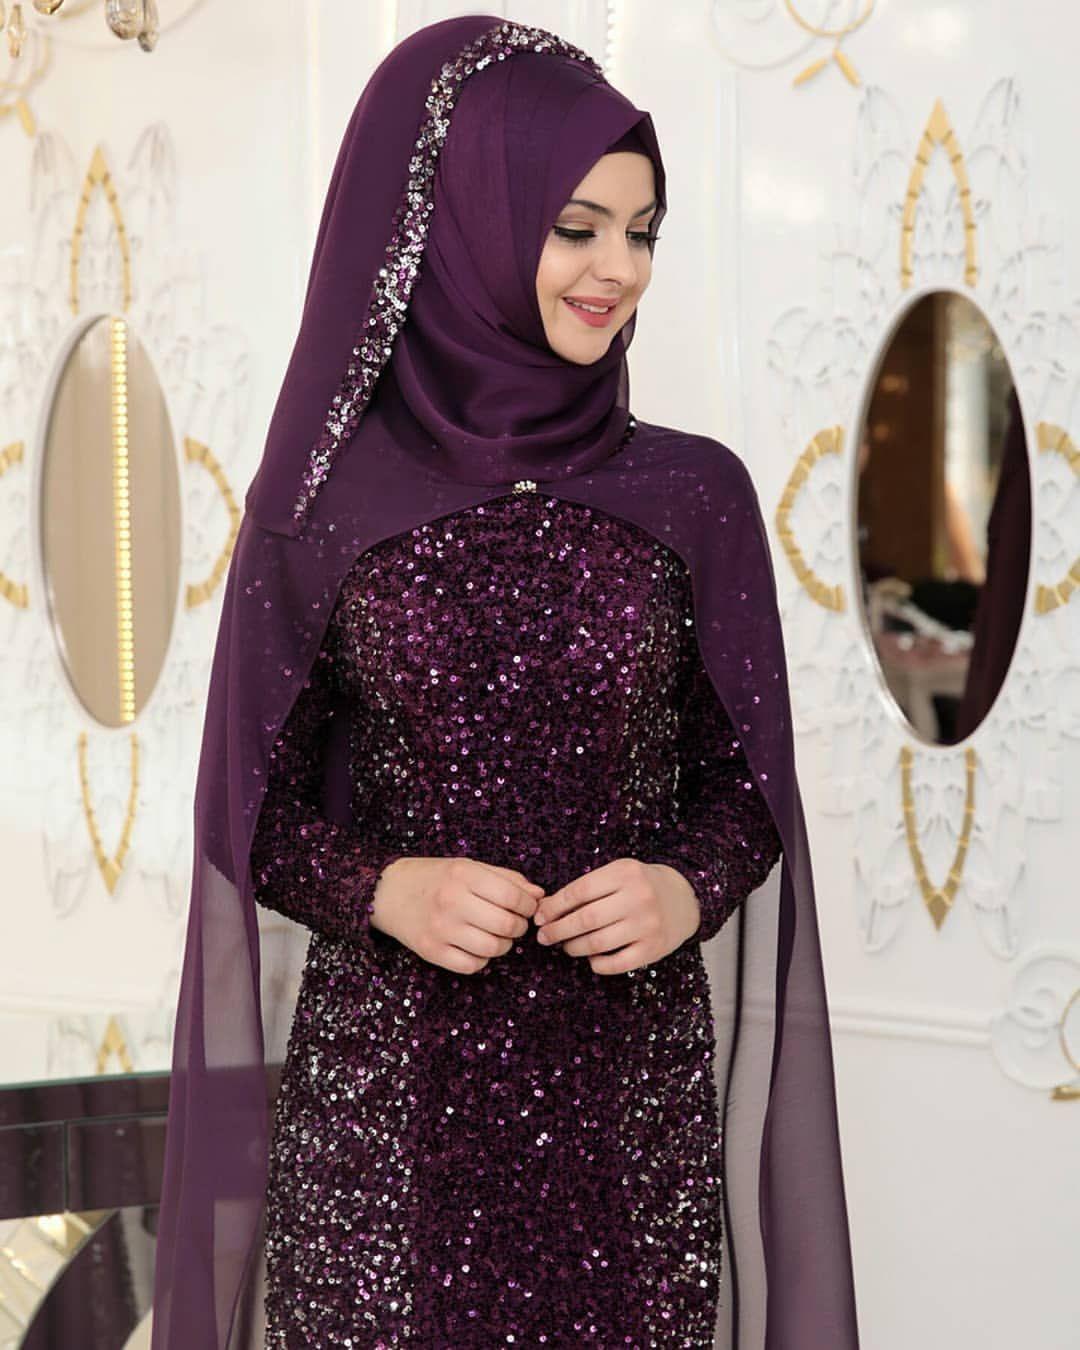 Pin By Lava On Www Tesetturelbisesi Com Hijab Fashion Hijabi Fashion Hijab Fashionista